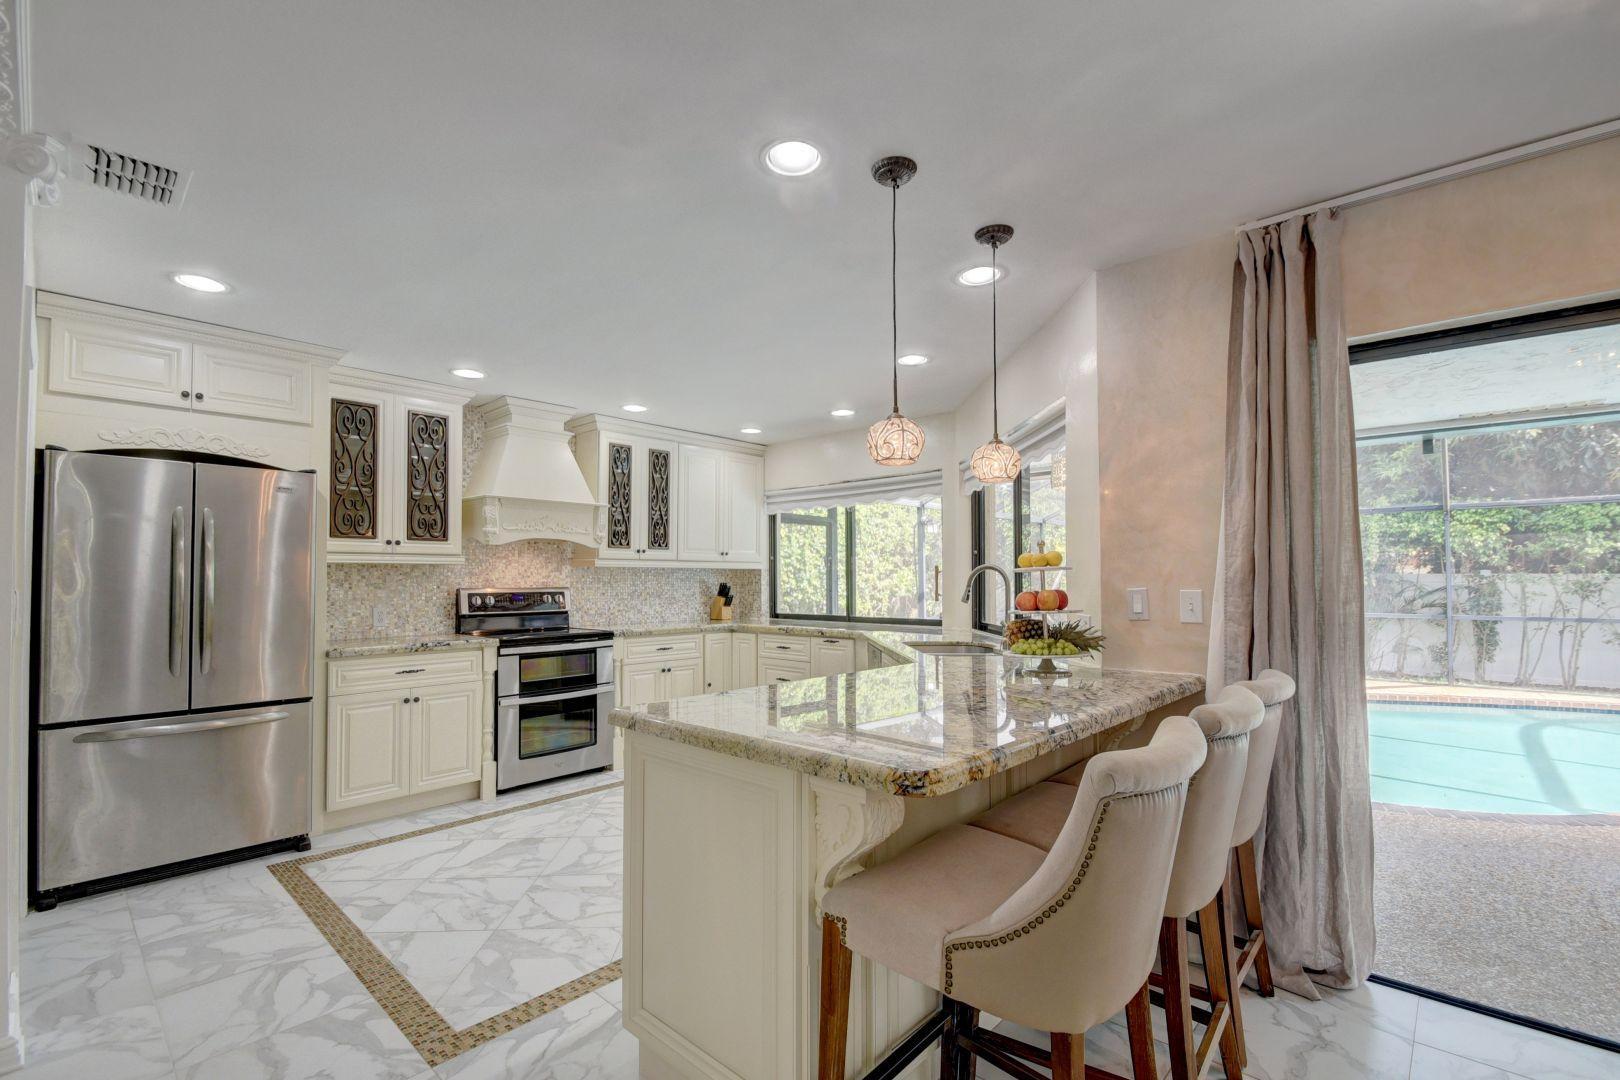 Home for sale in BOCA MADERA UNIT 2 Boca Raton Florida